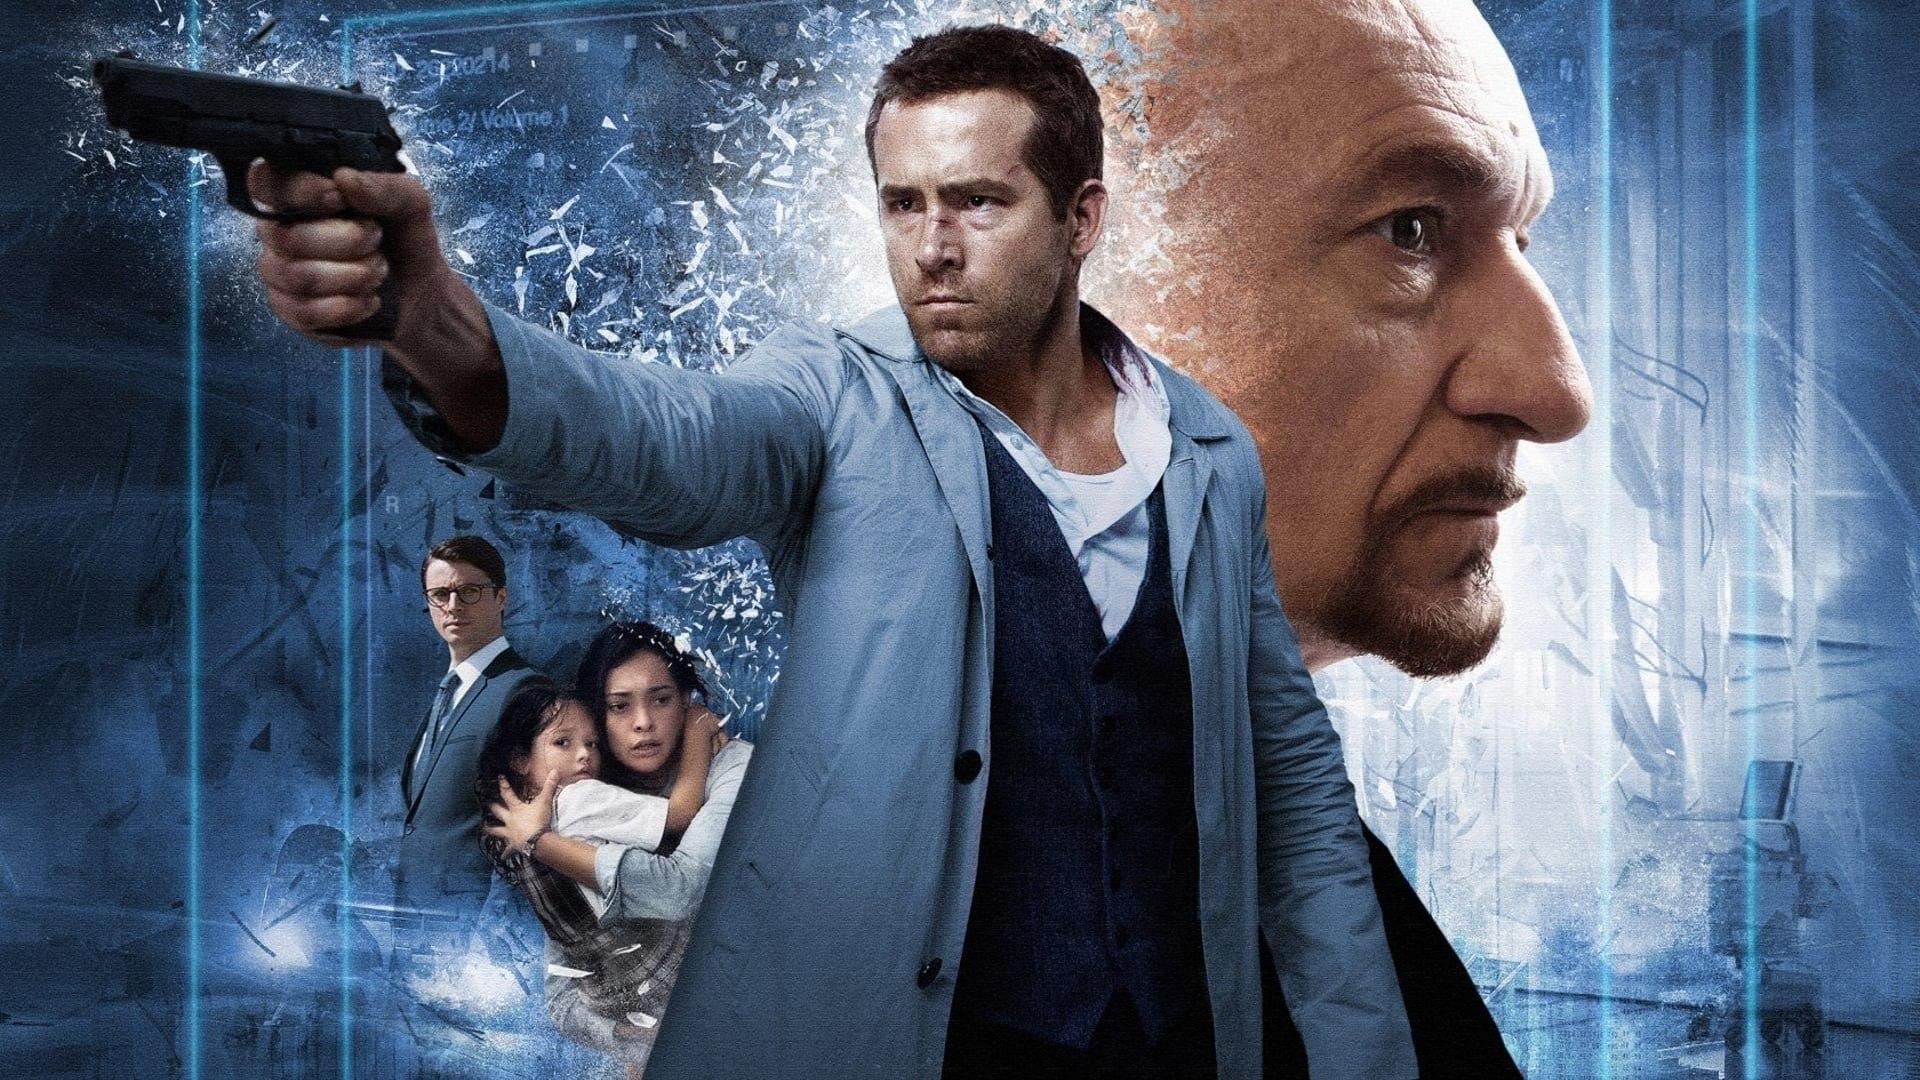 Martedi 29 Settembre 2020 Sky Cinema HD, Self-Less